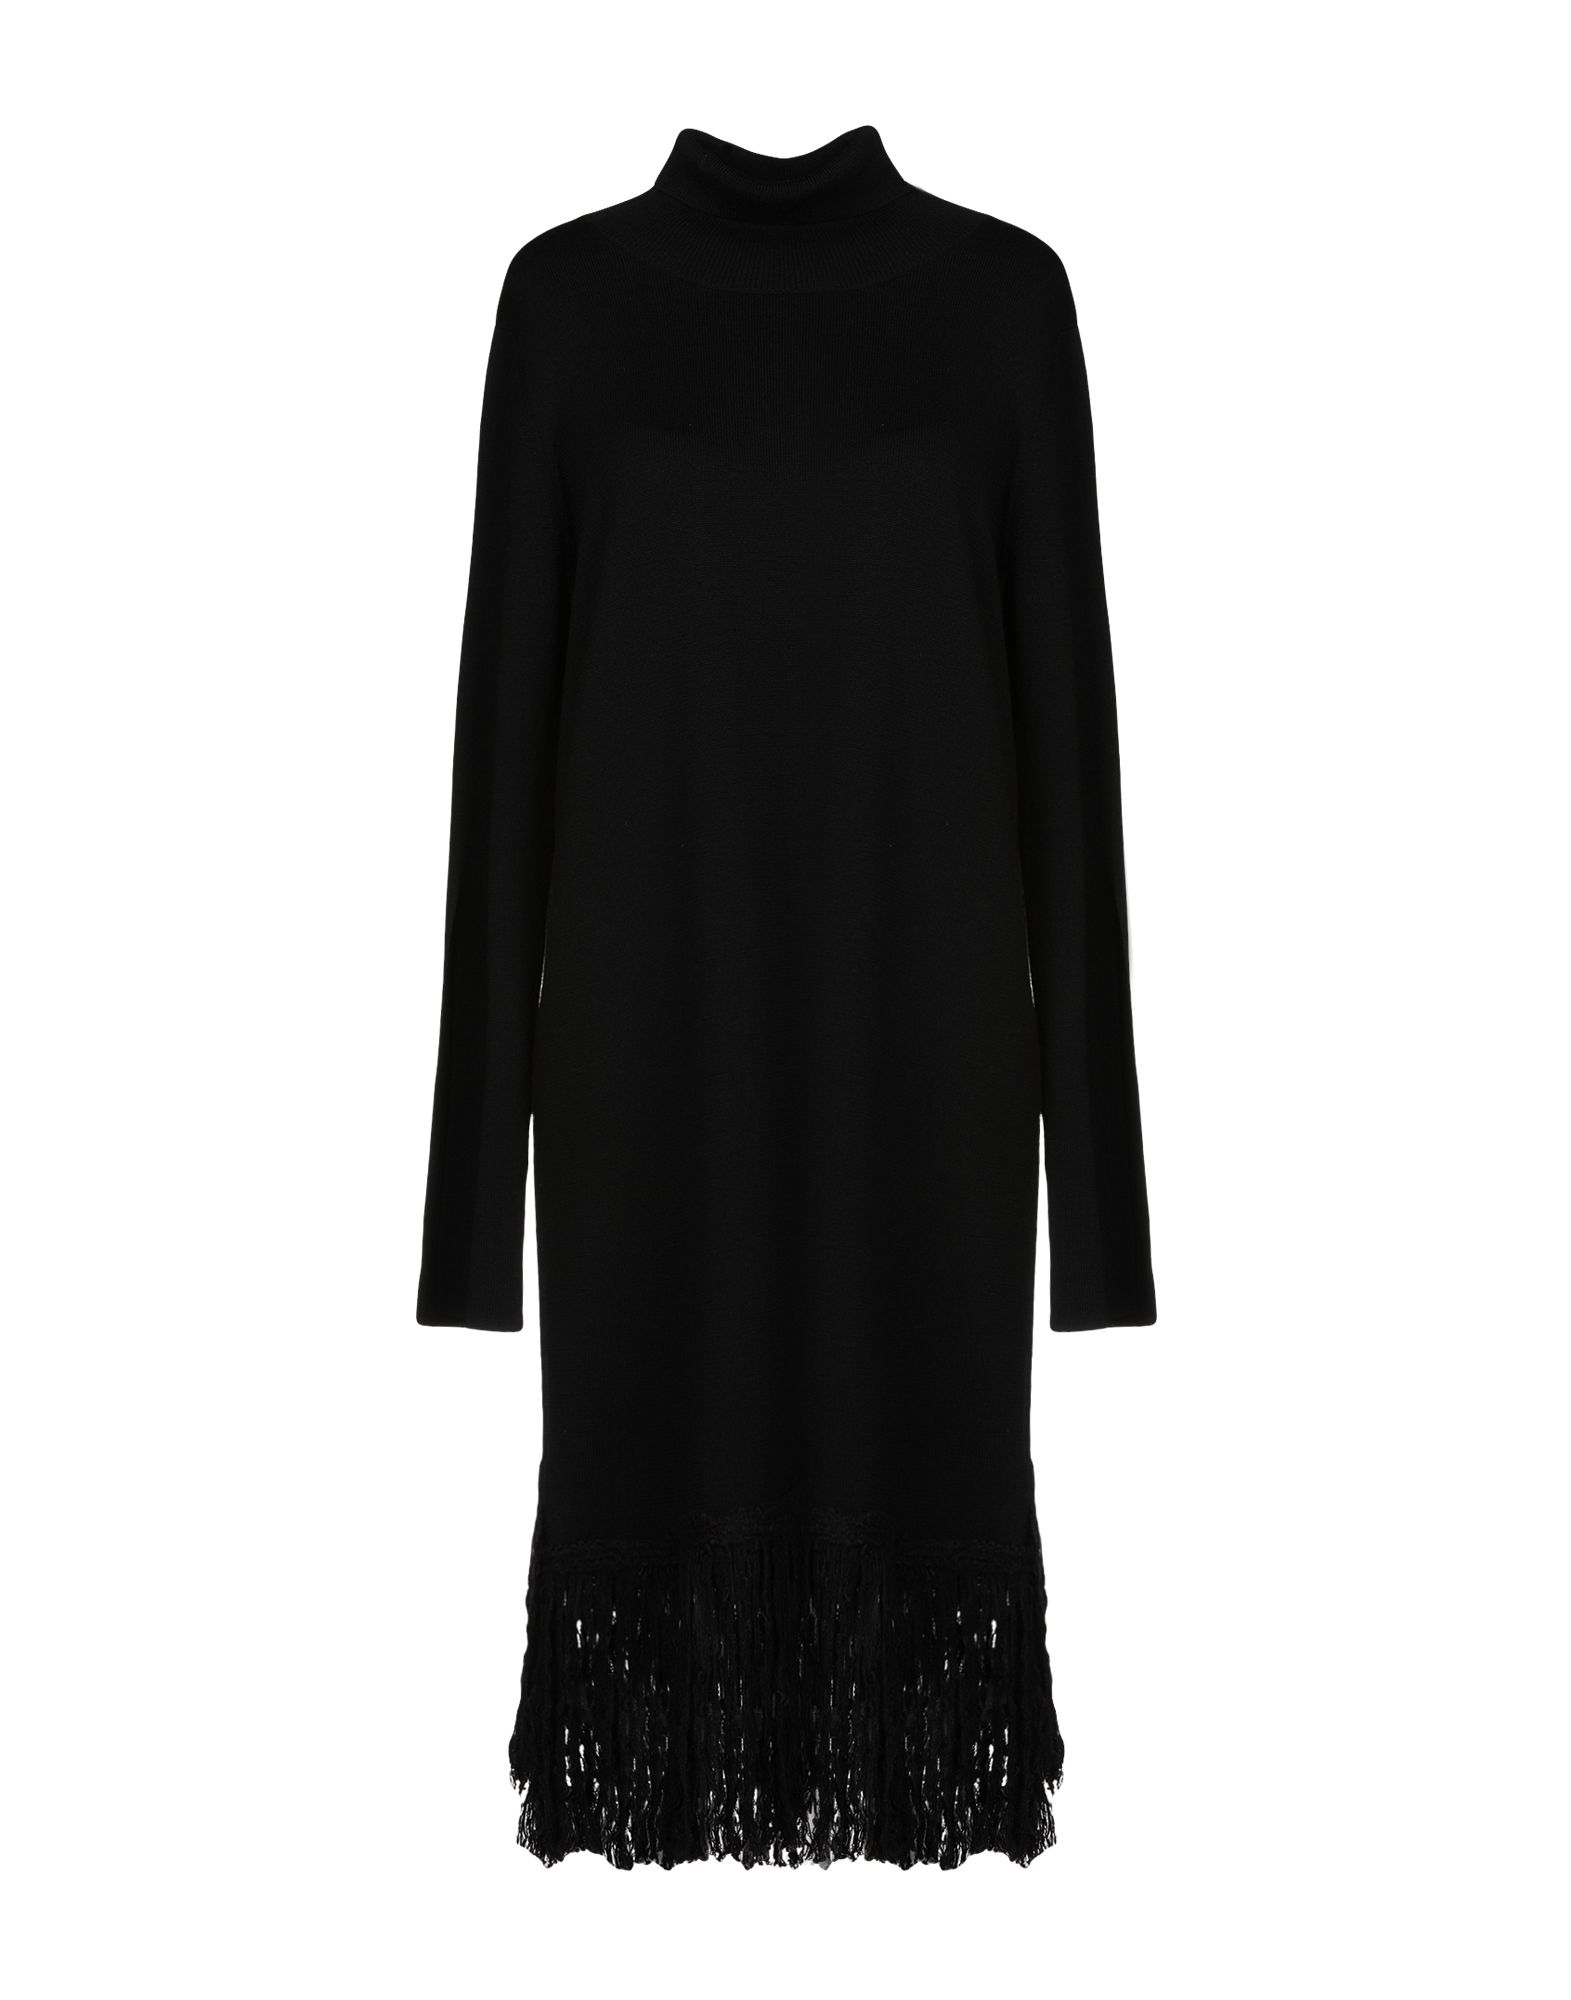 Iris & Ink Short Dress In Black